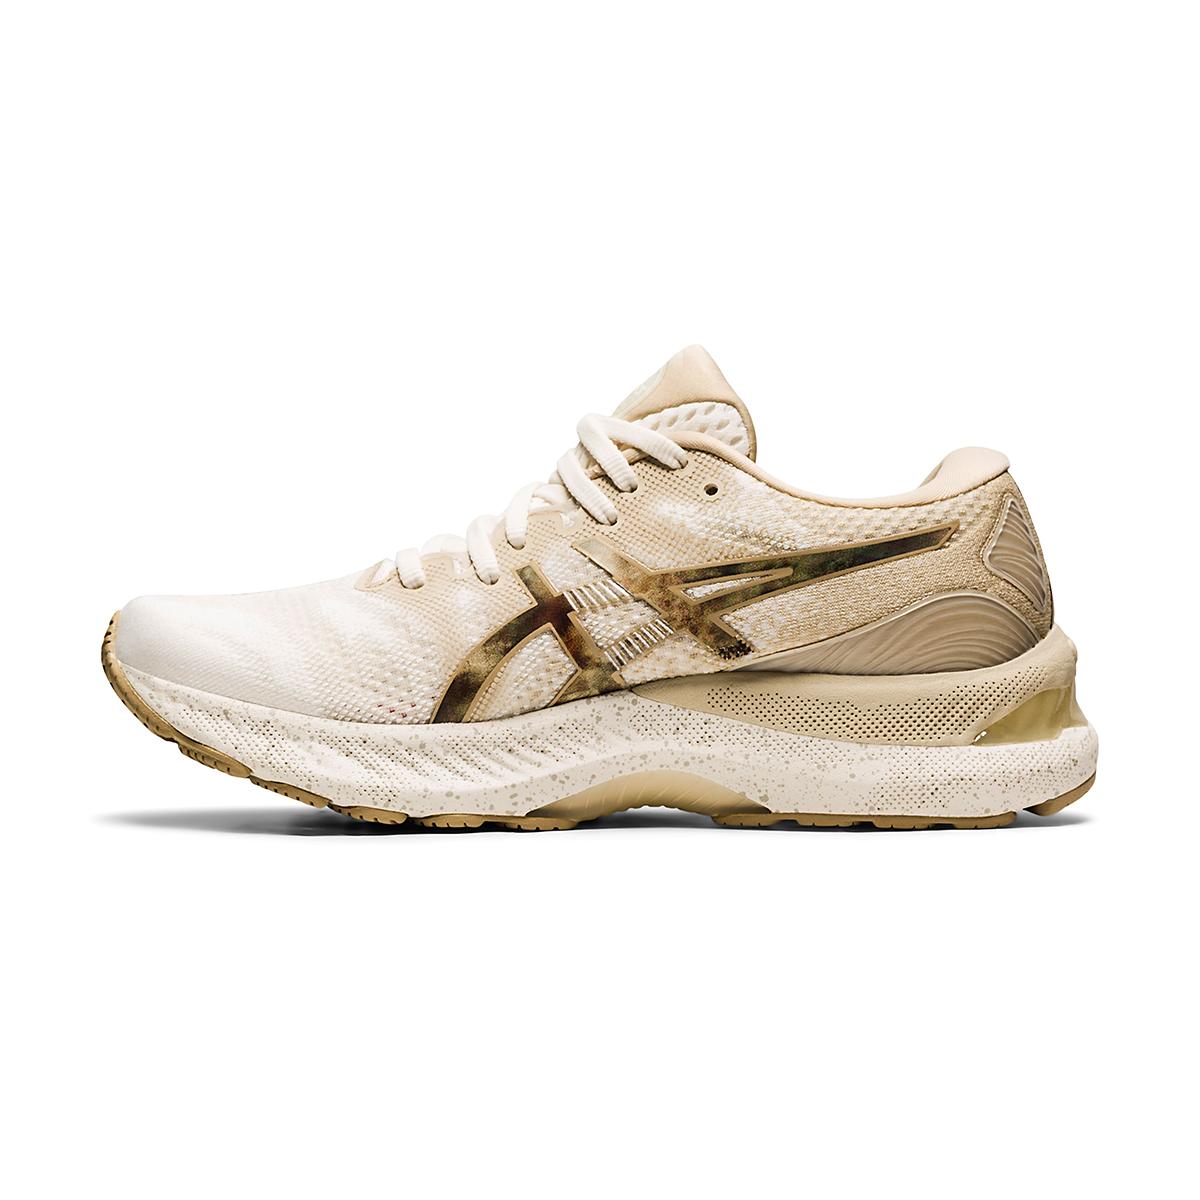 Women's Asics Gel-Nimbus 23 Earth Day Running Shoe - Color: Cream/Putty - Size: 5 - Width: Regular, Cream/Putty, large, image 2